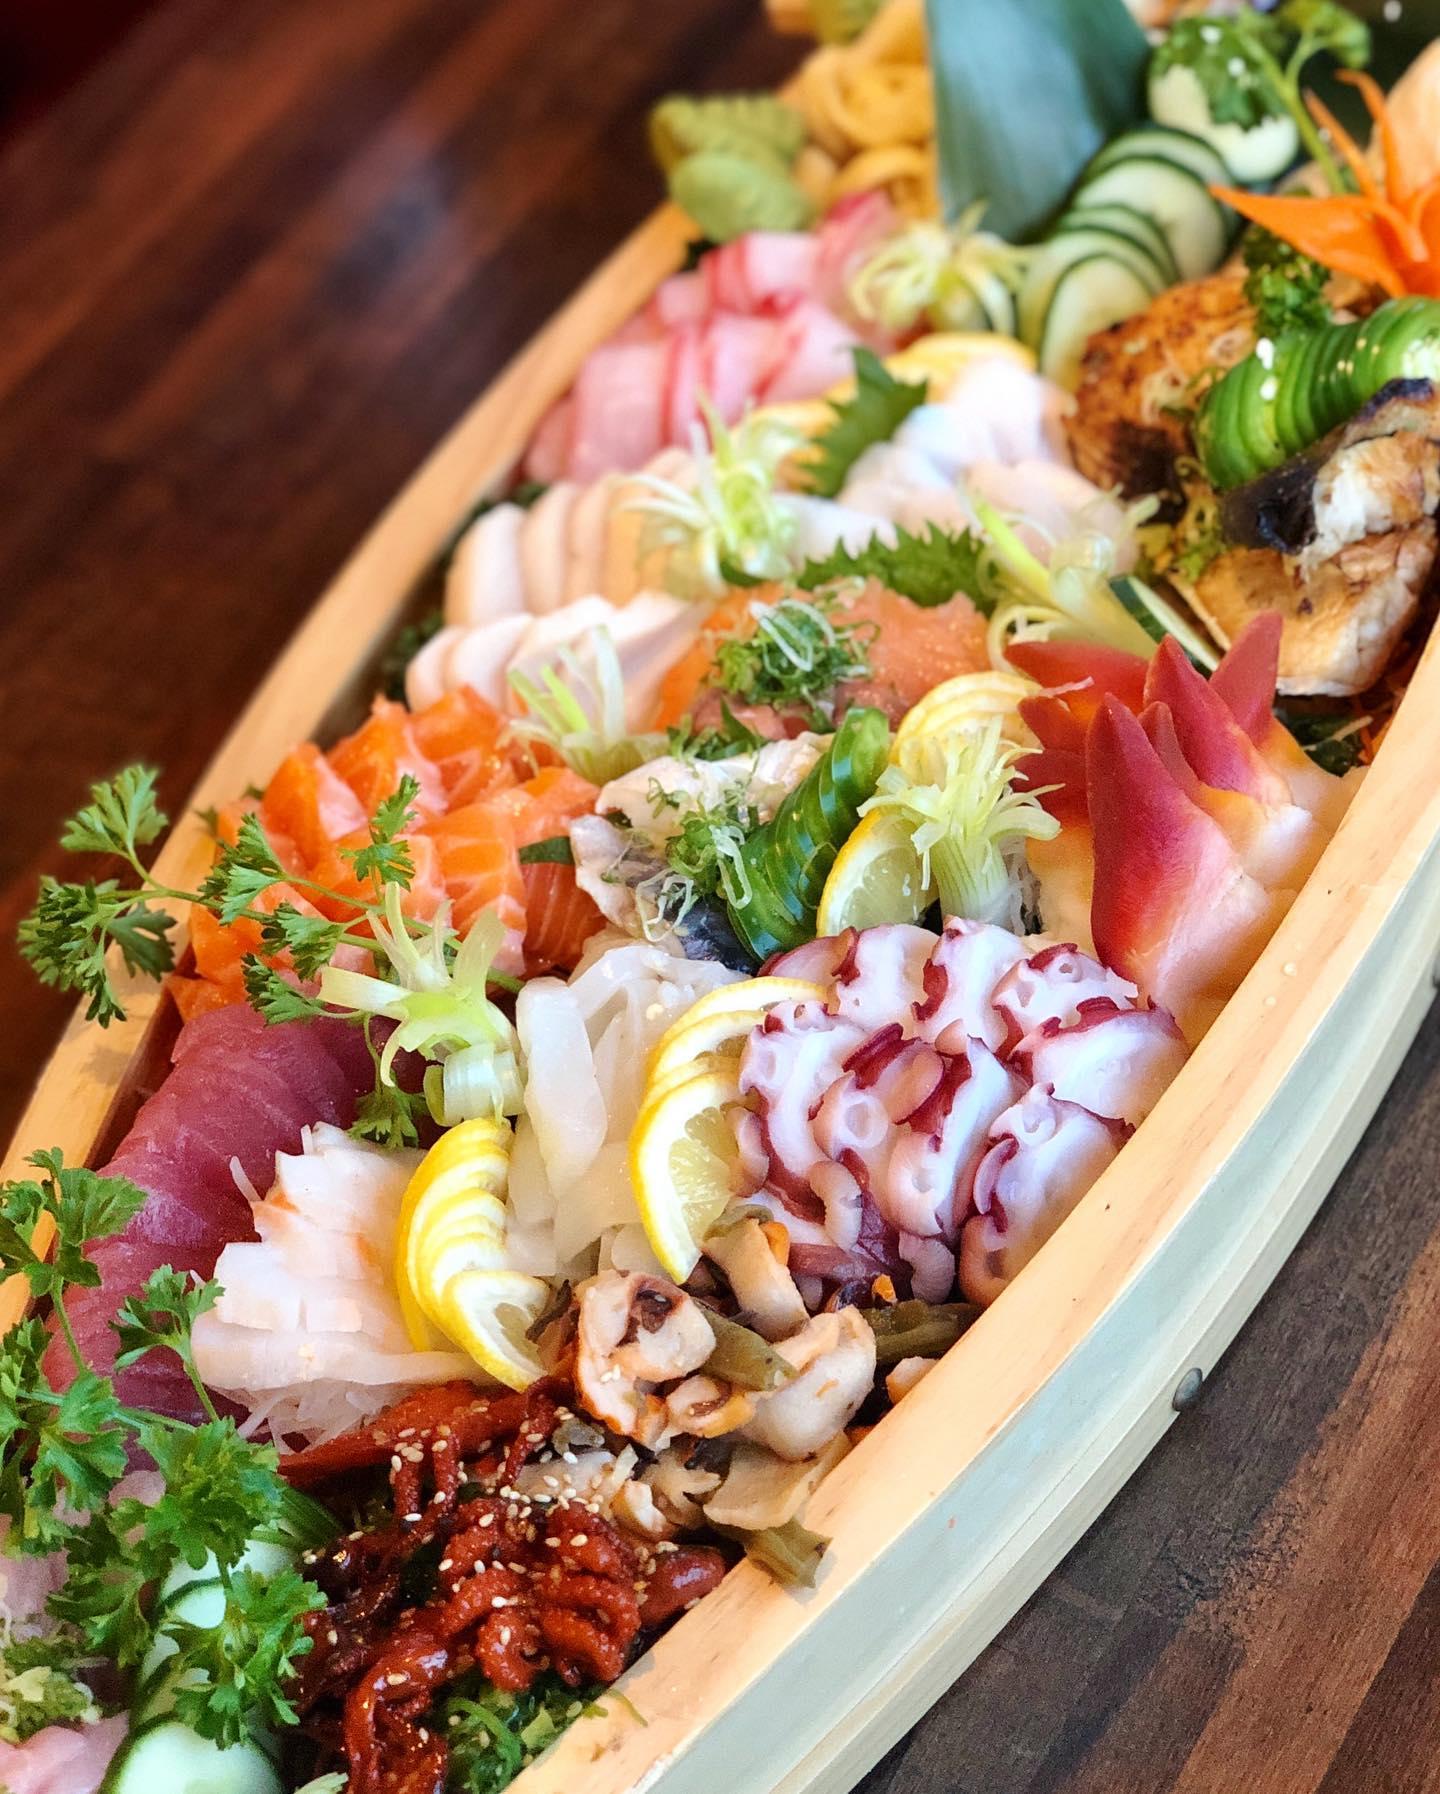 Oishi Sushi & Japanese Steak House 5800 34th St N, St. Petersburg